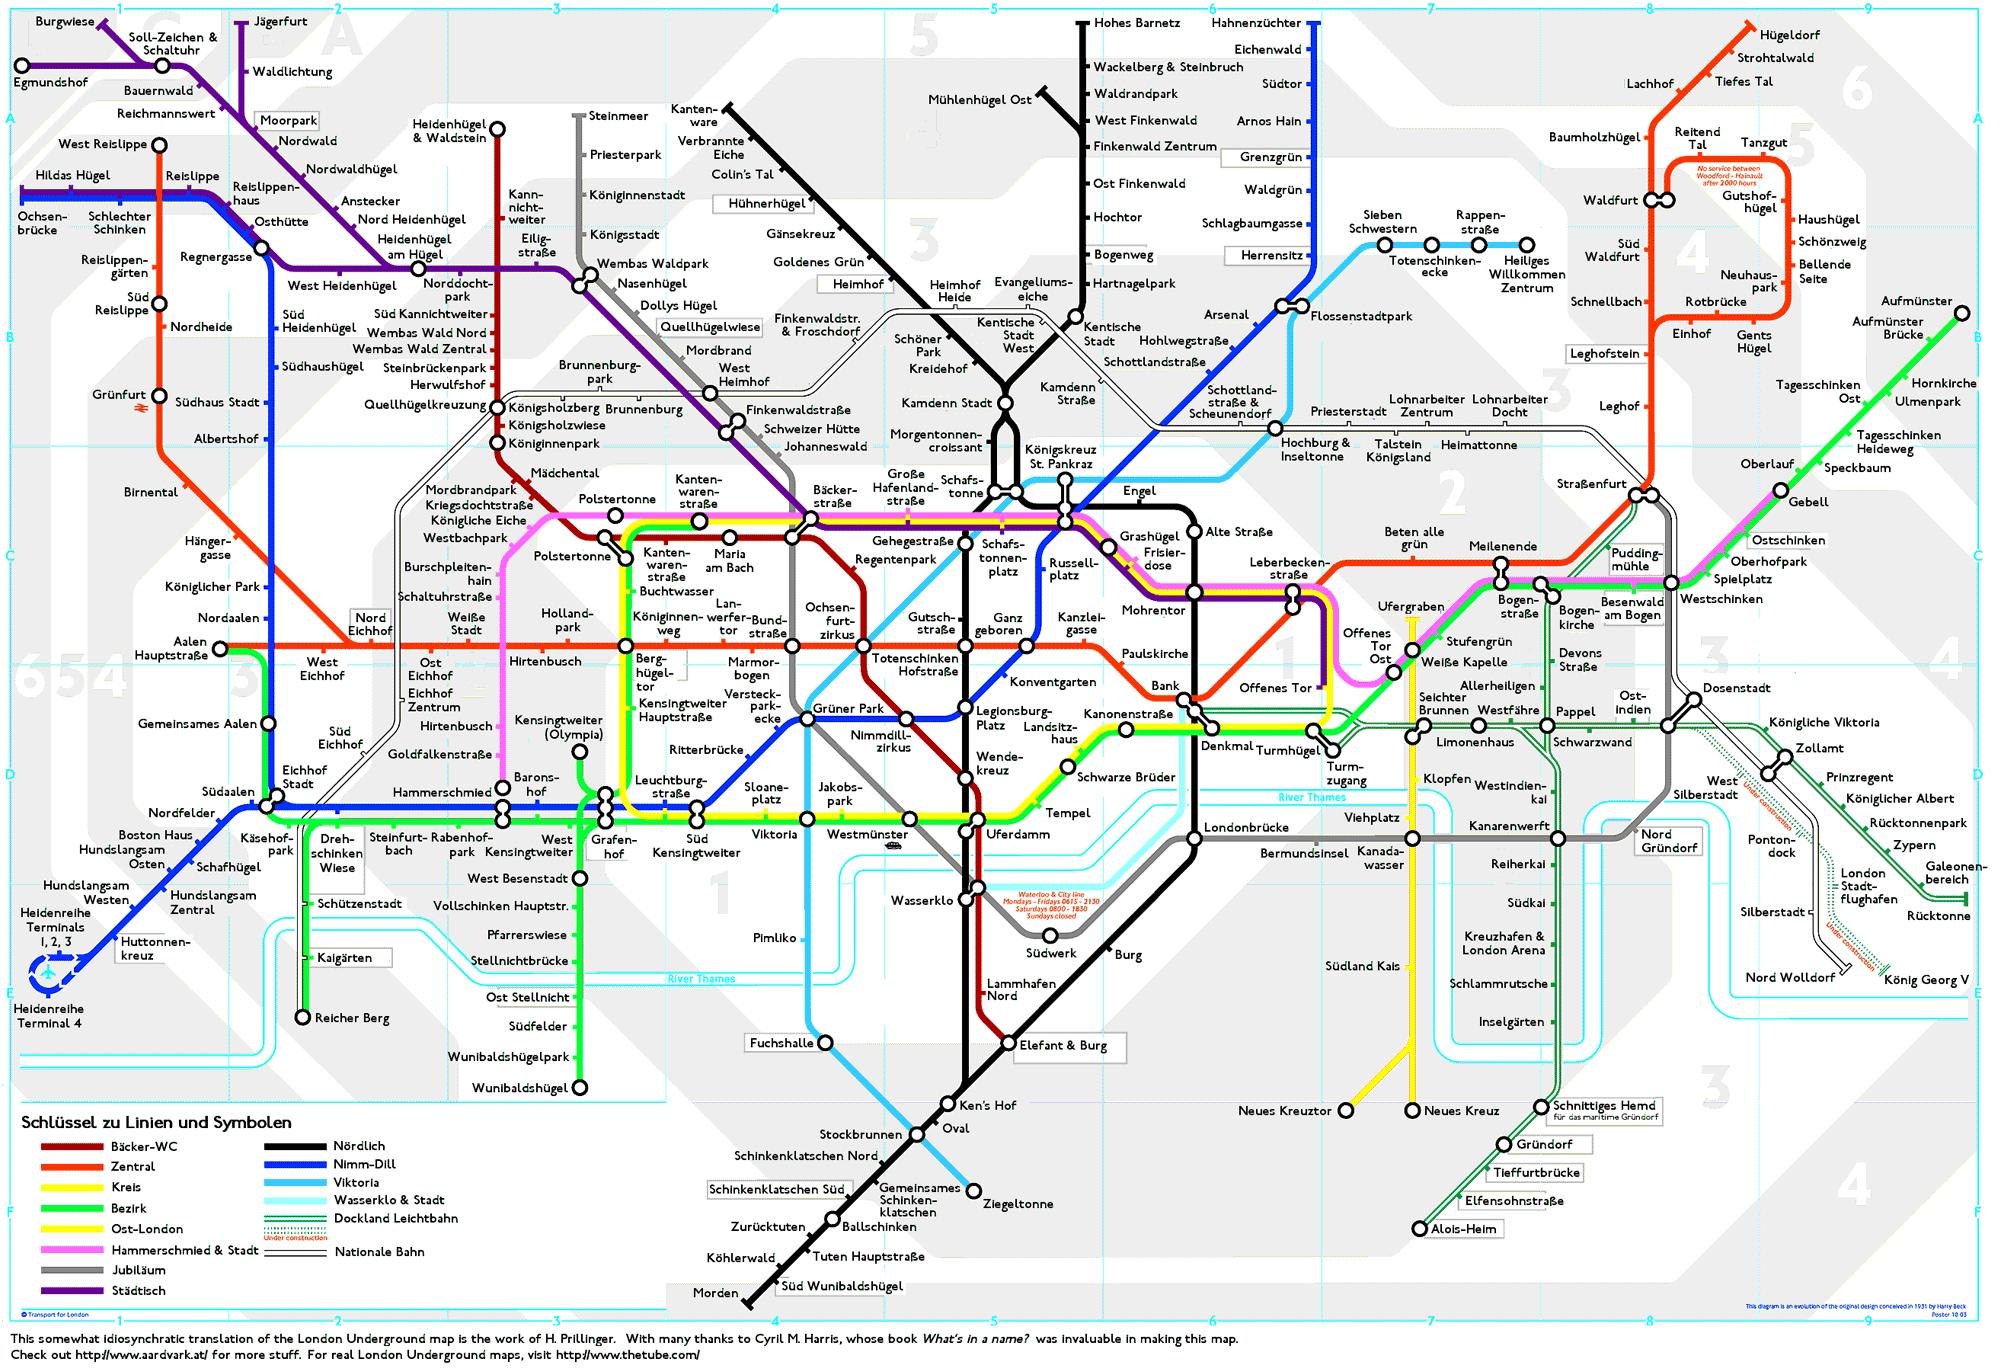 London Underground Map translated into German